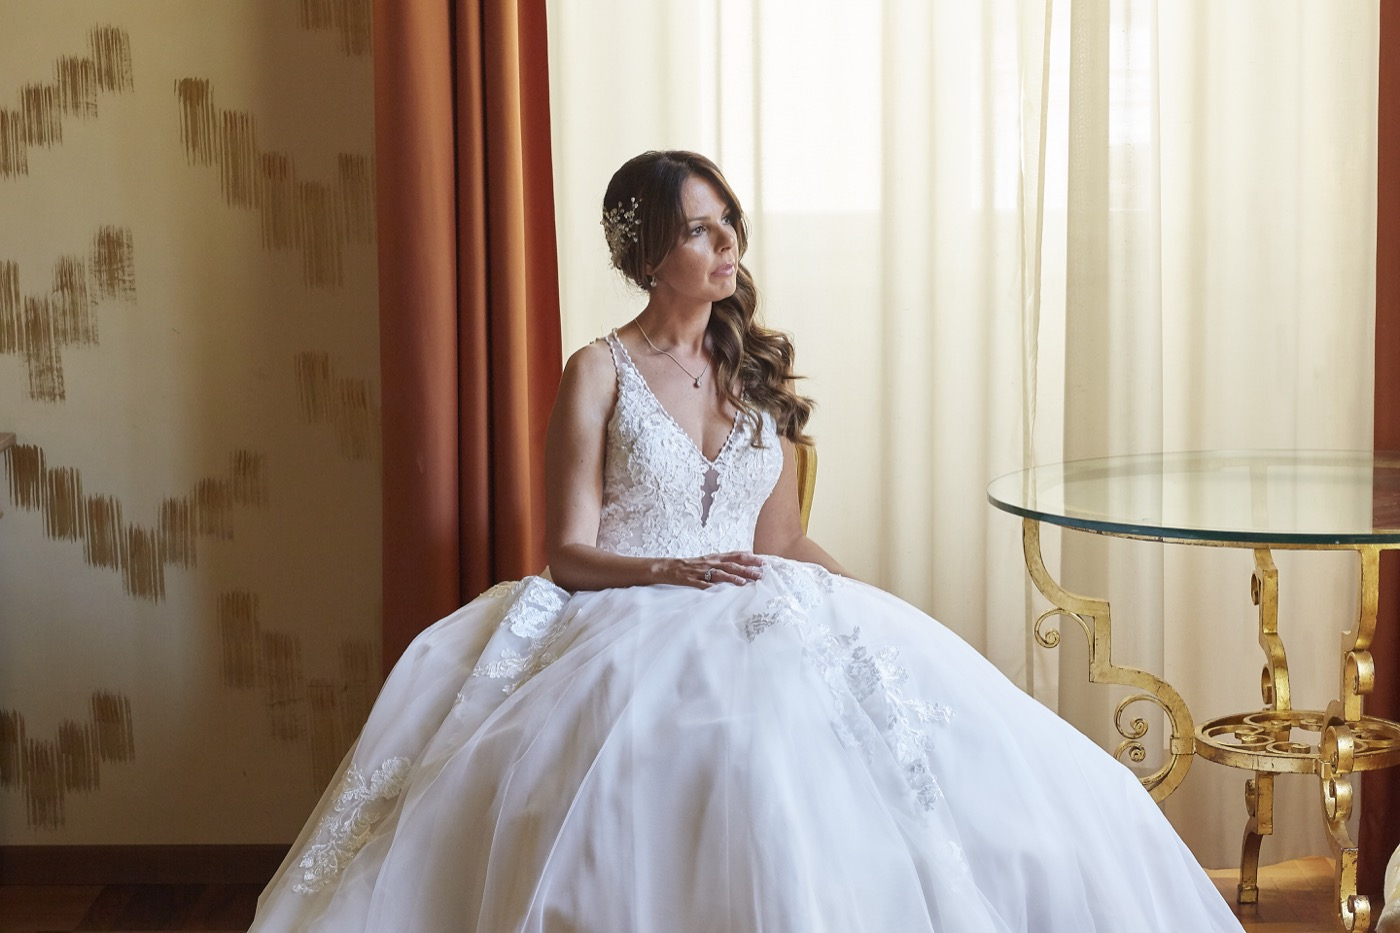 Claudio-Coppola-wedding-photographer-la-scuderia-eventi-preparativi-la-rosetta-perugia-31